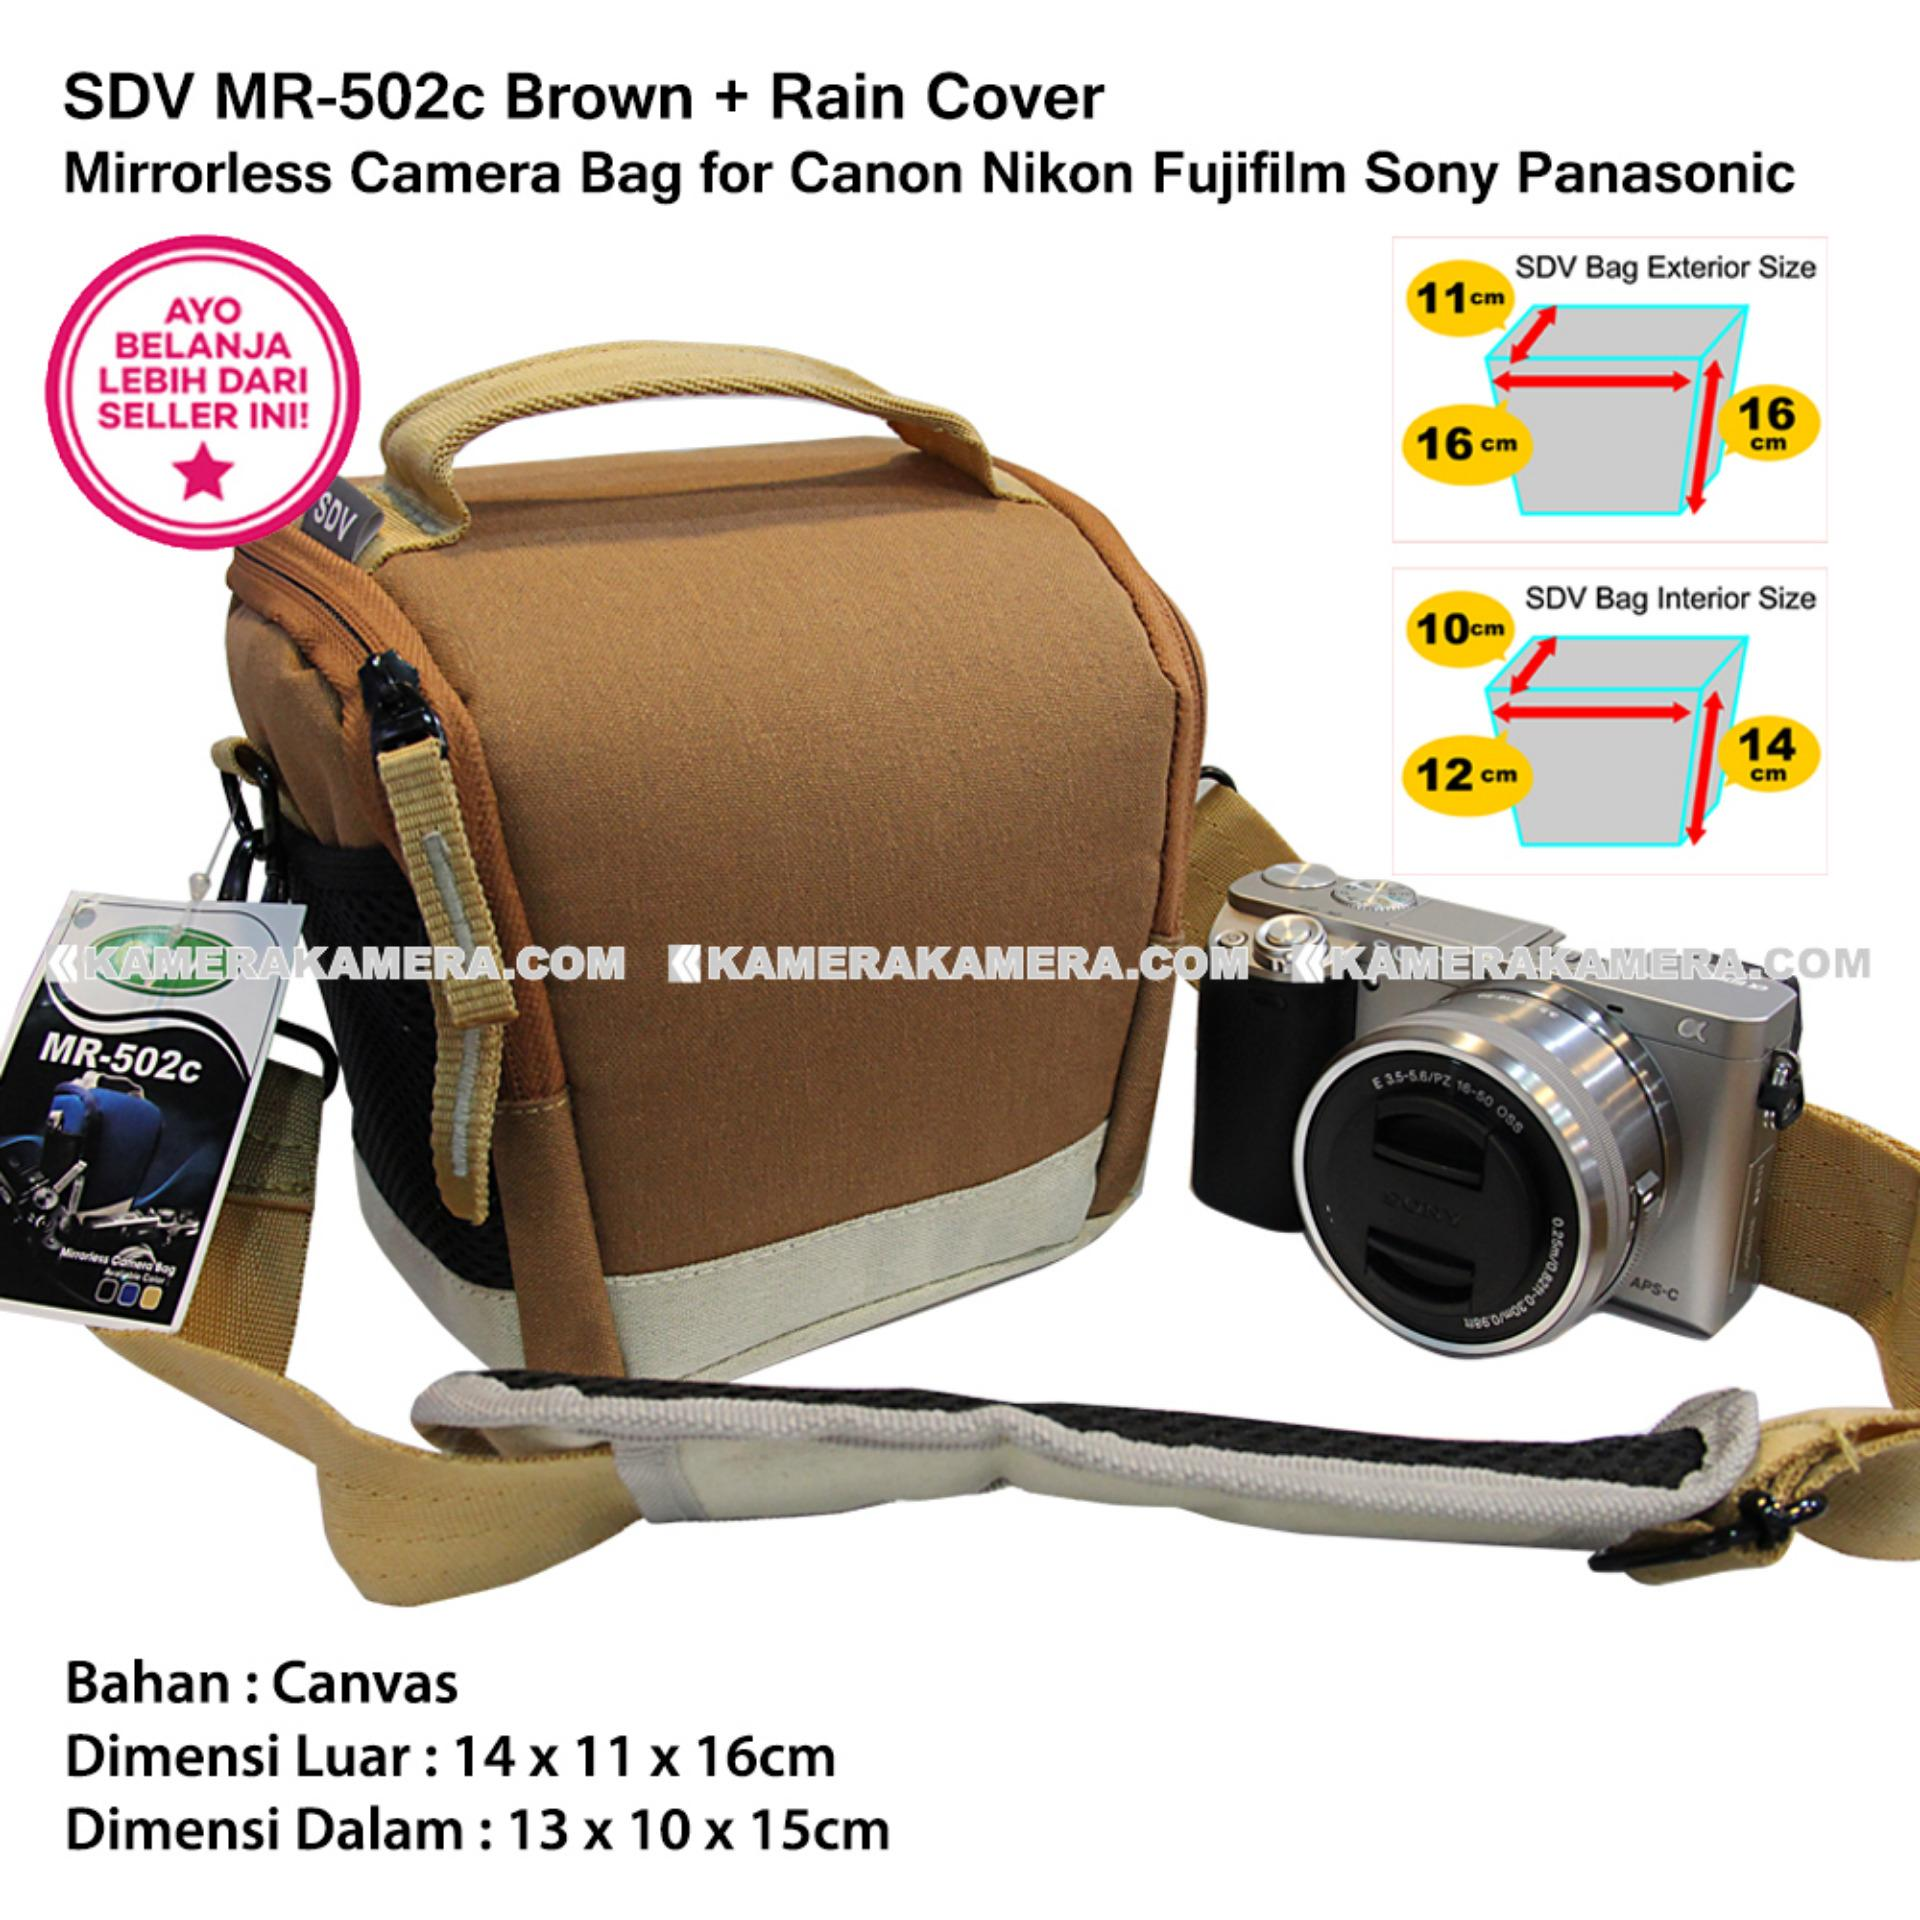 SDV MR-502c Brown Canvas Bag with Rain Cover Tas Kamera Mirrorless Canon Nikon Sony FujiFilm Panasonic Olympus Samsung